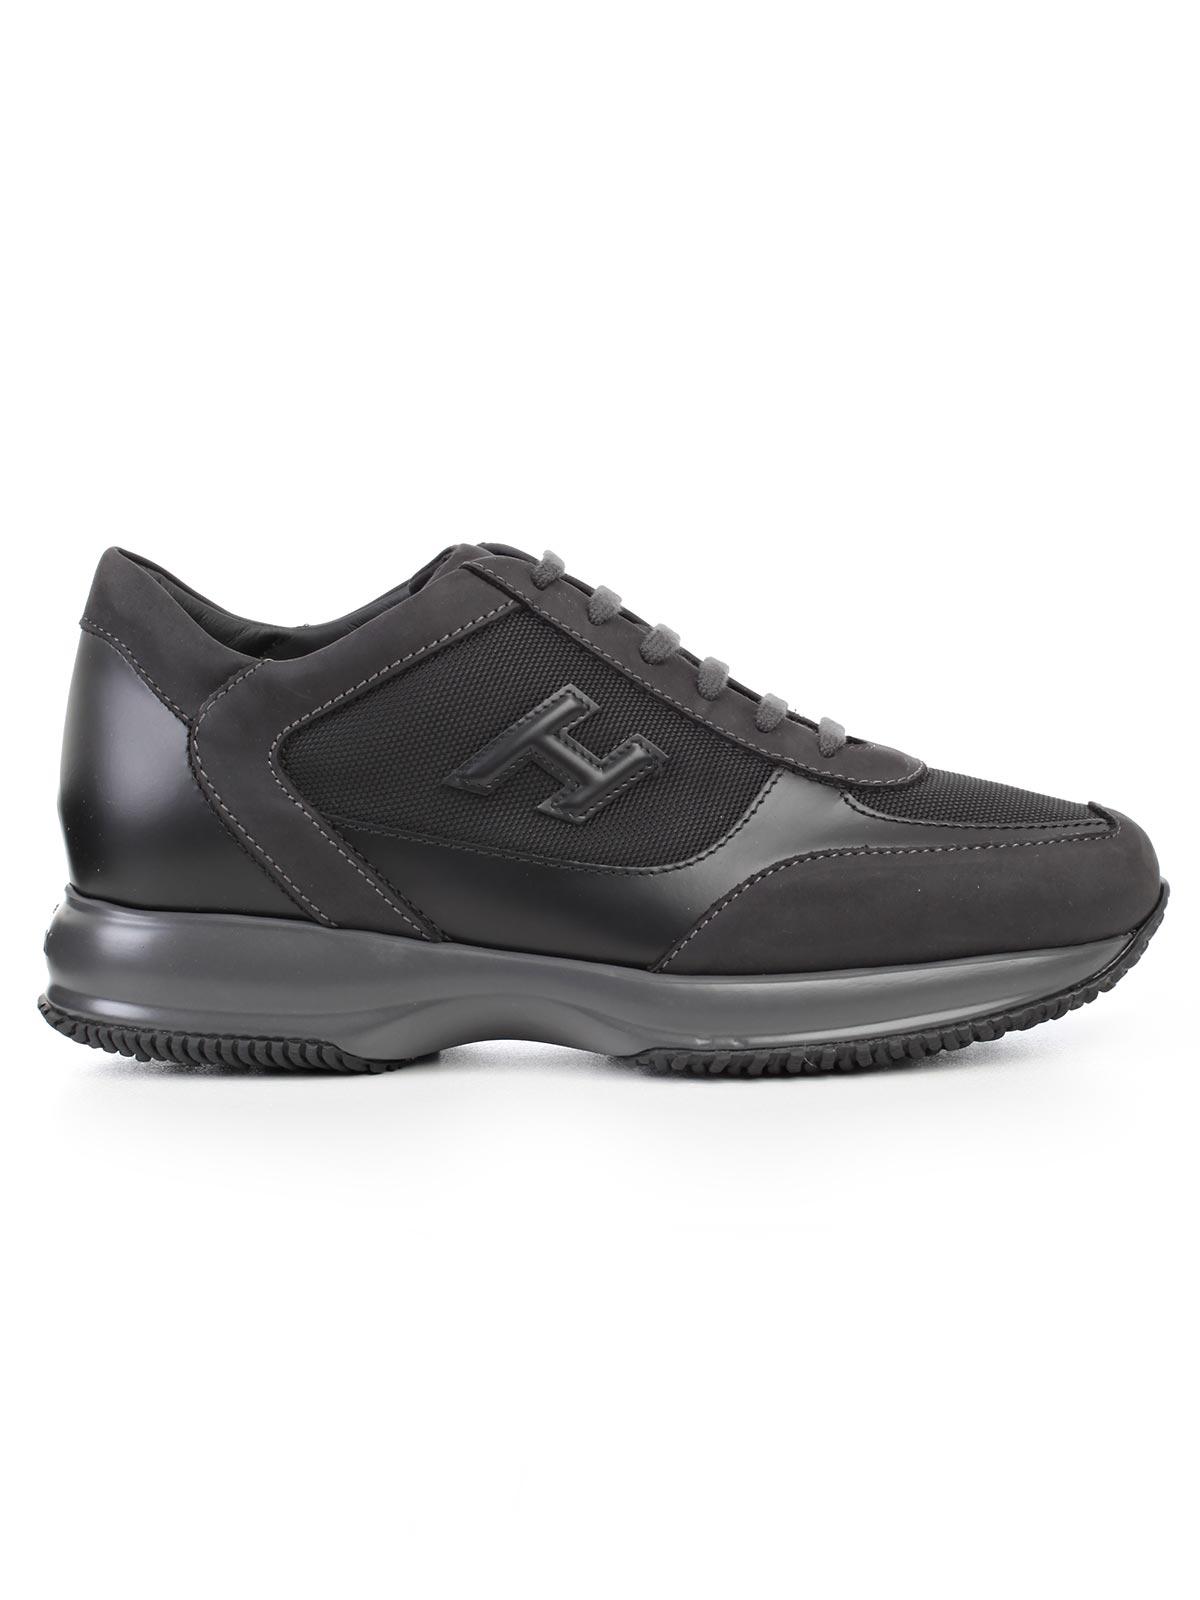 Picture of HOGAN FOOTWEAR SCARPA INTERACTIVE